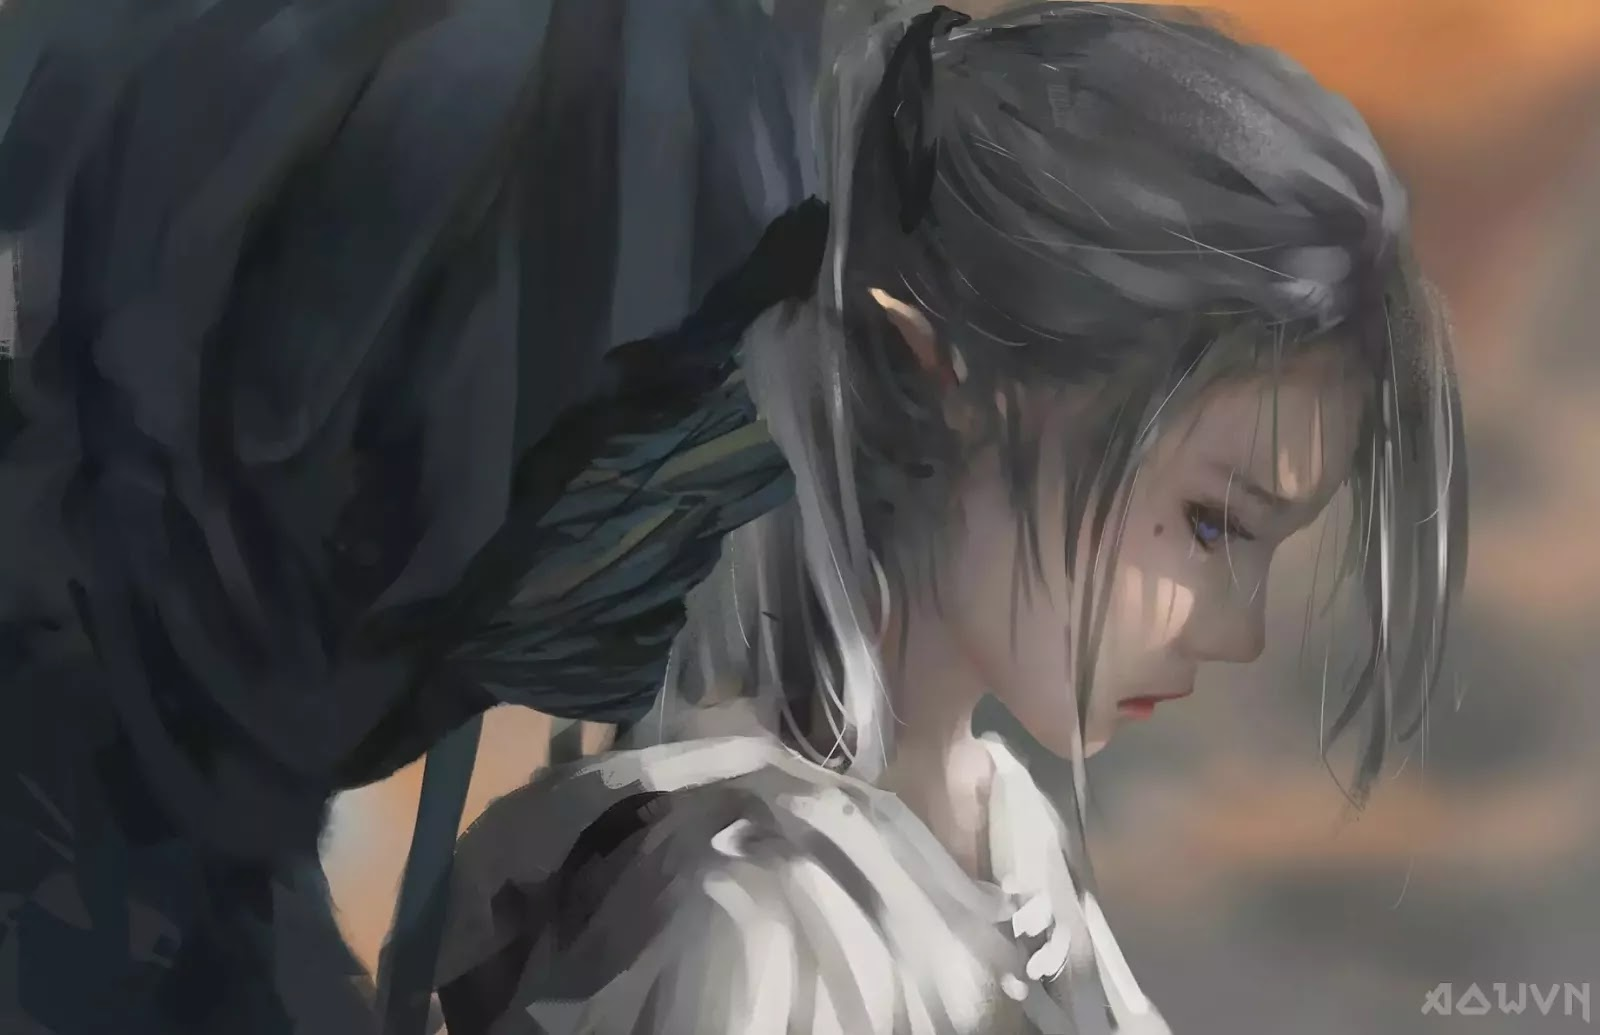 90 AowVN.org m - [ Hình Nền ] Anime Cực Đẹp by Wlop | Wallpaper Premium / Update